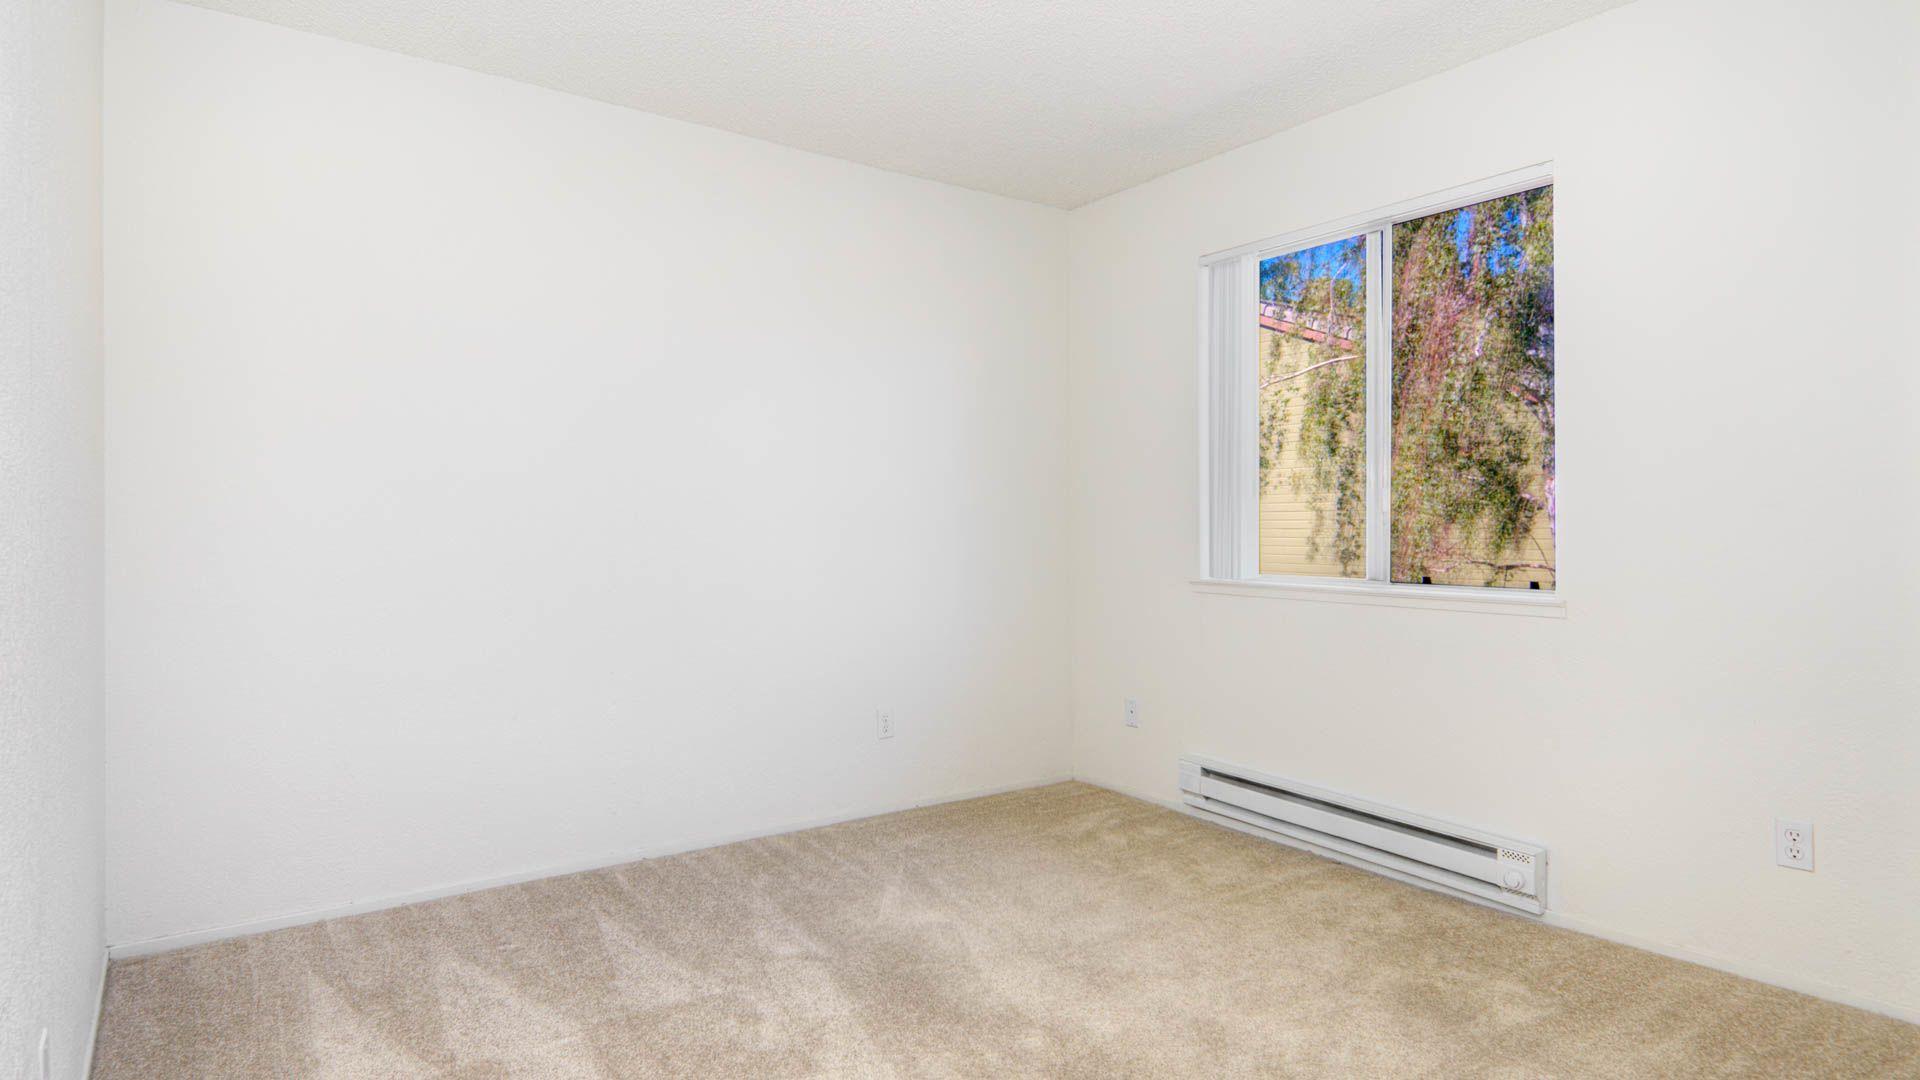 Woodleaf Apartments - Bedroom